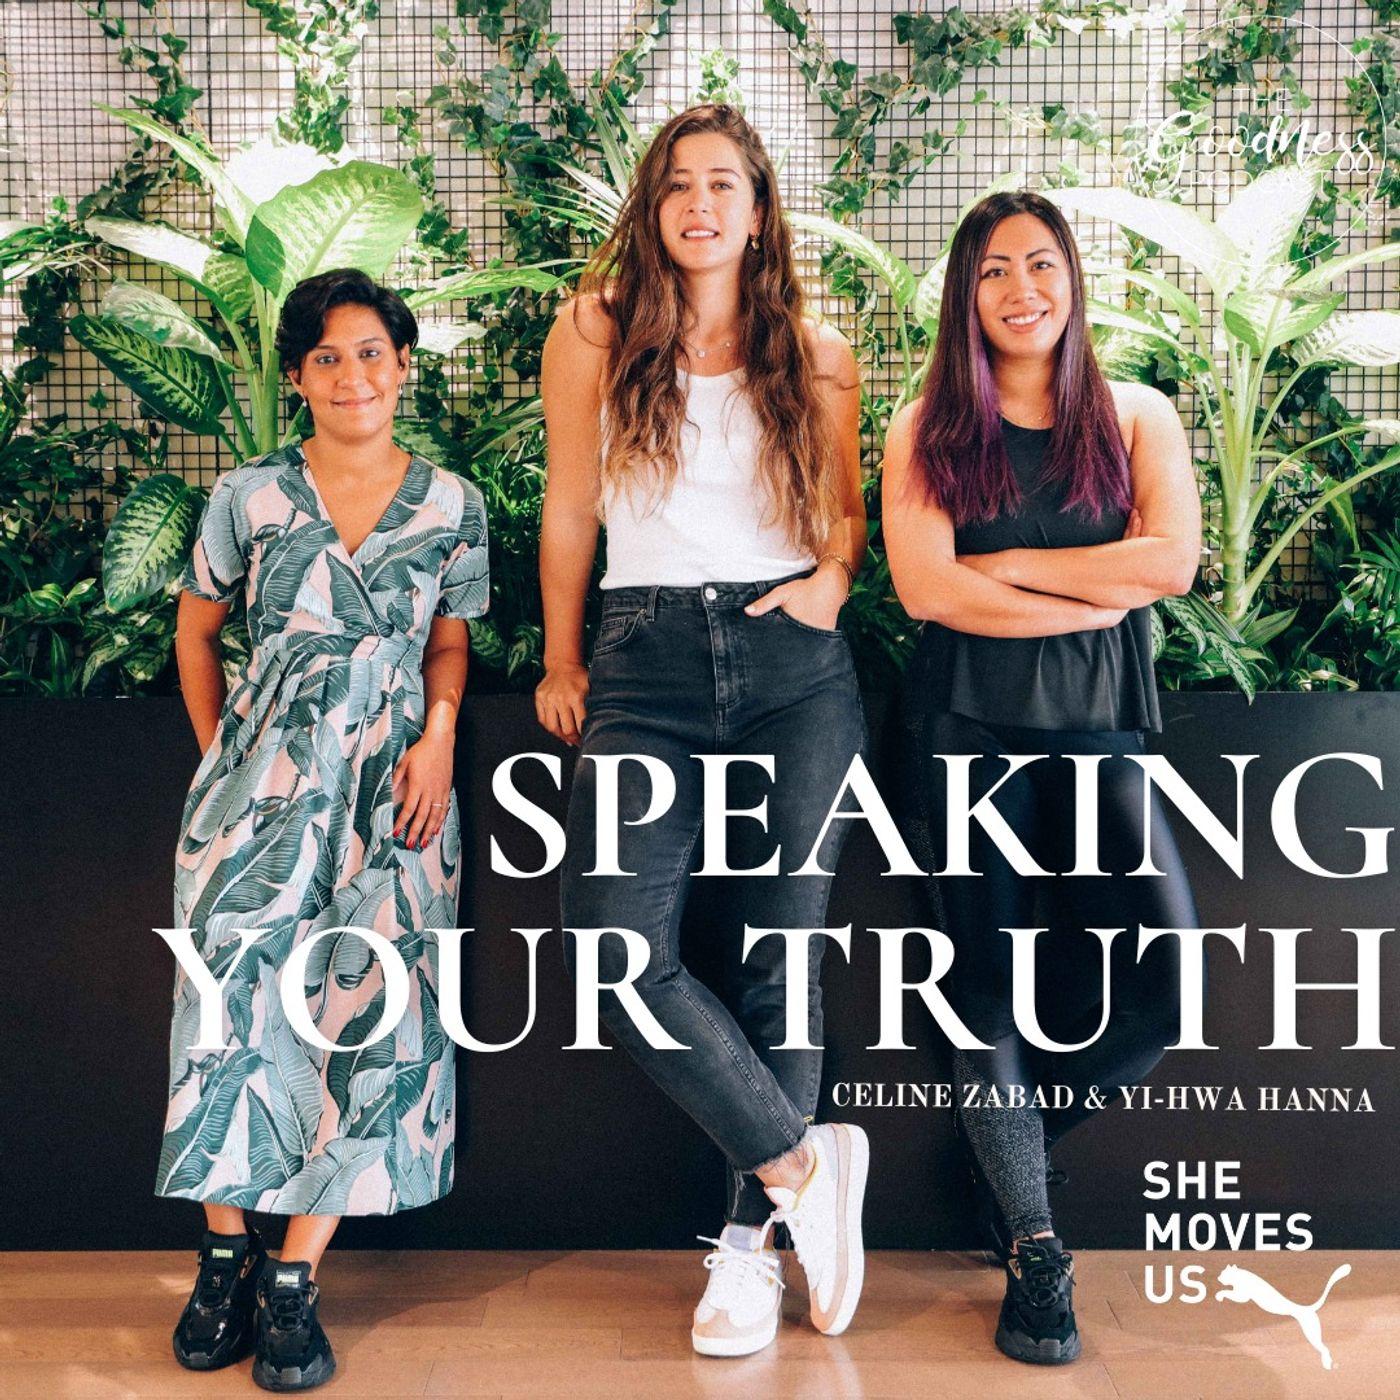 Celine Zabad & Yi-Hwa Hanna: Speaking Your Truth